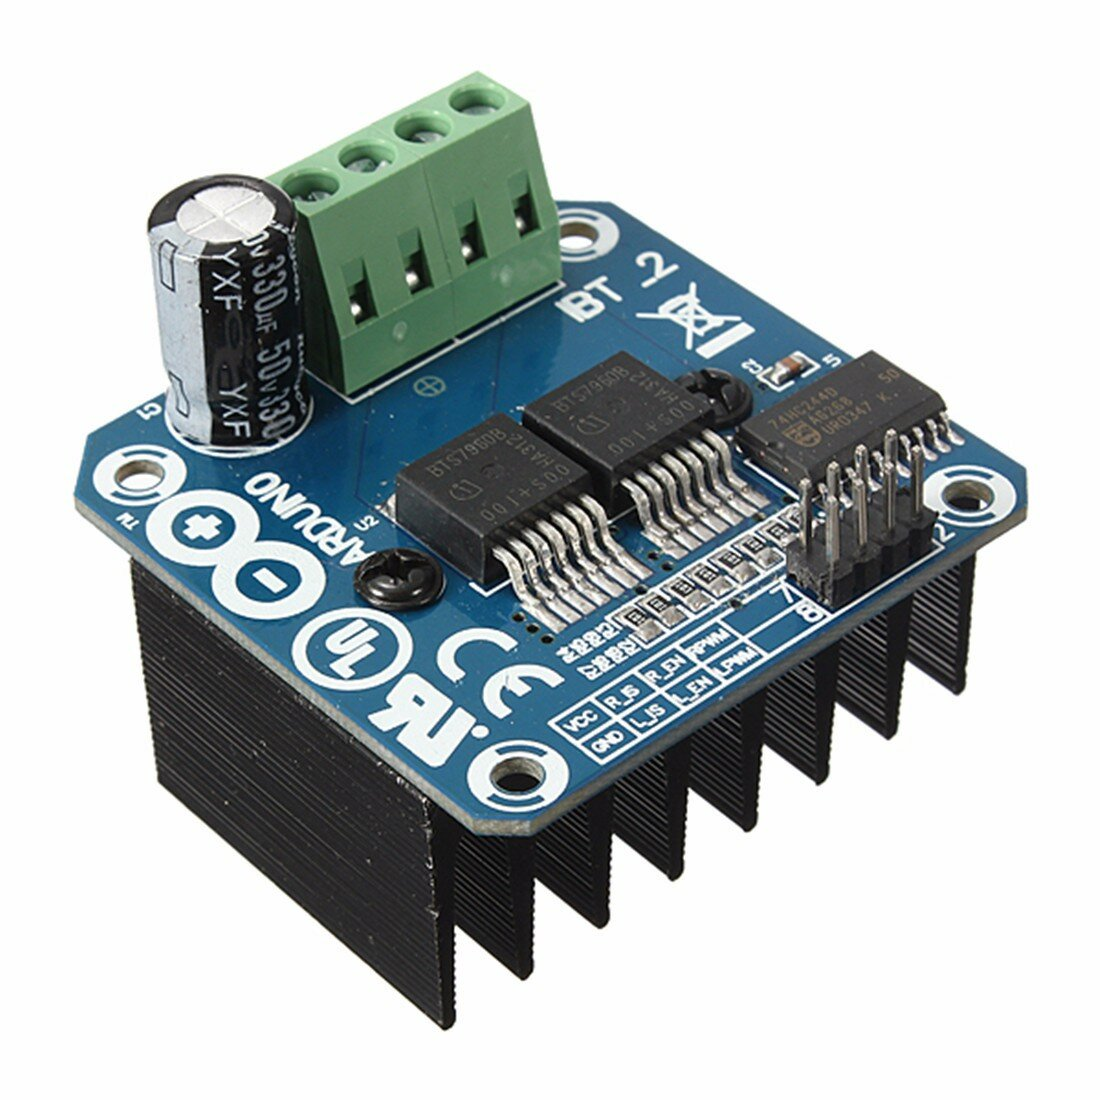 Semiconductor BTS7960B 5V 43A H-bridge Motor Driver Module For Arduino